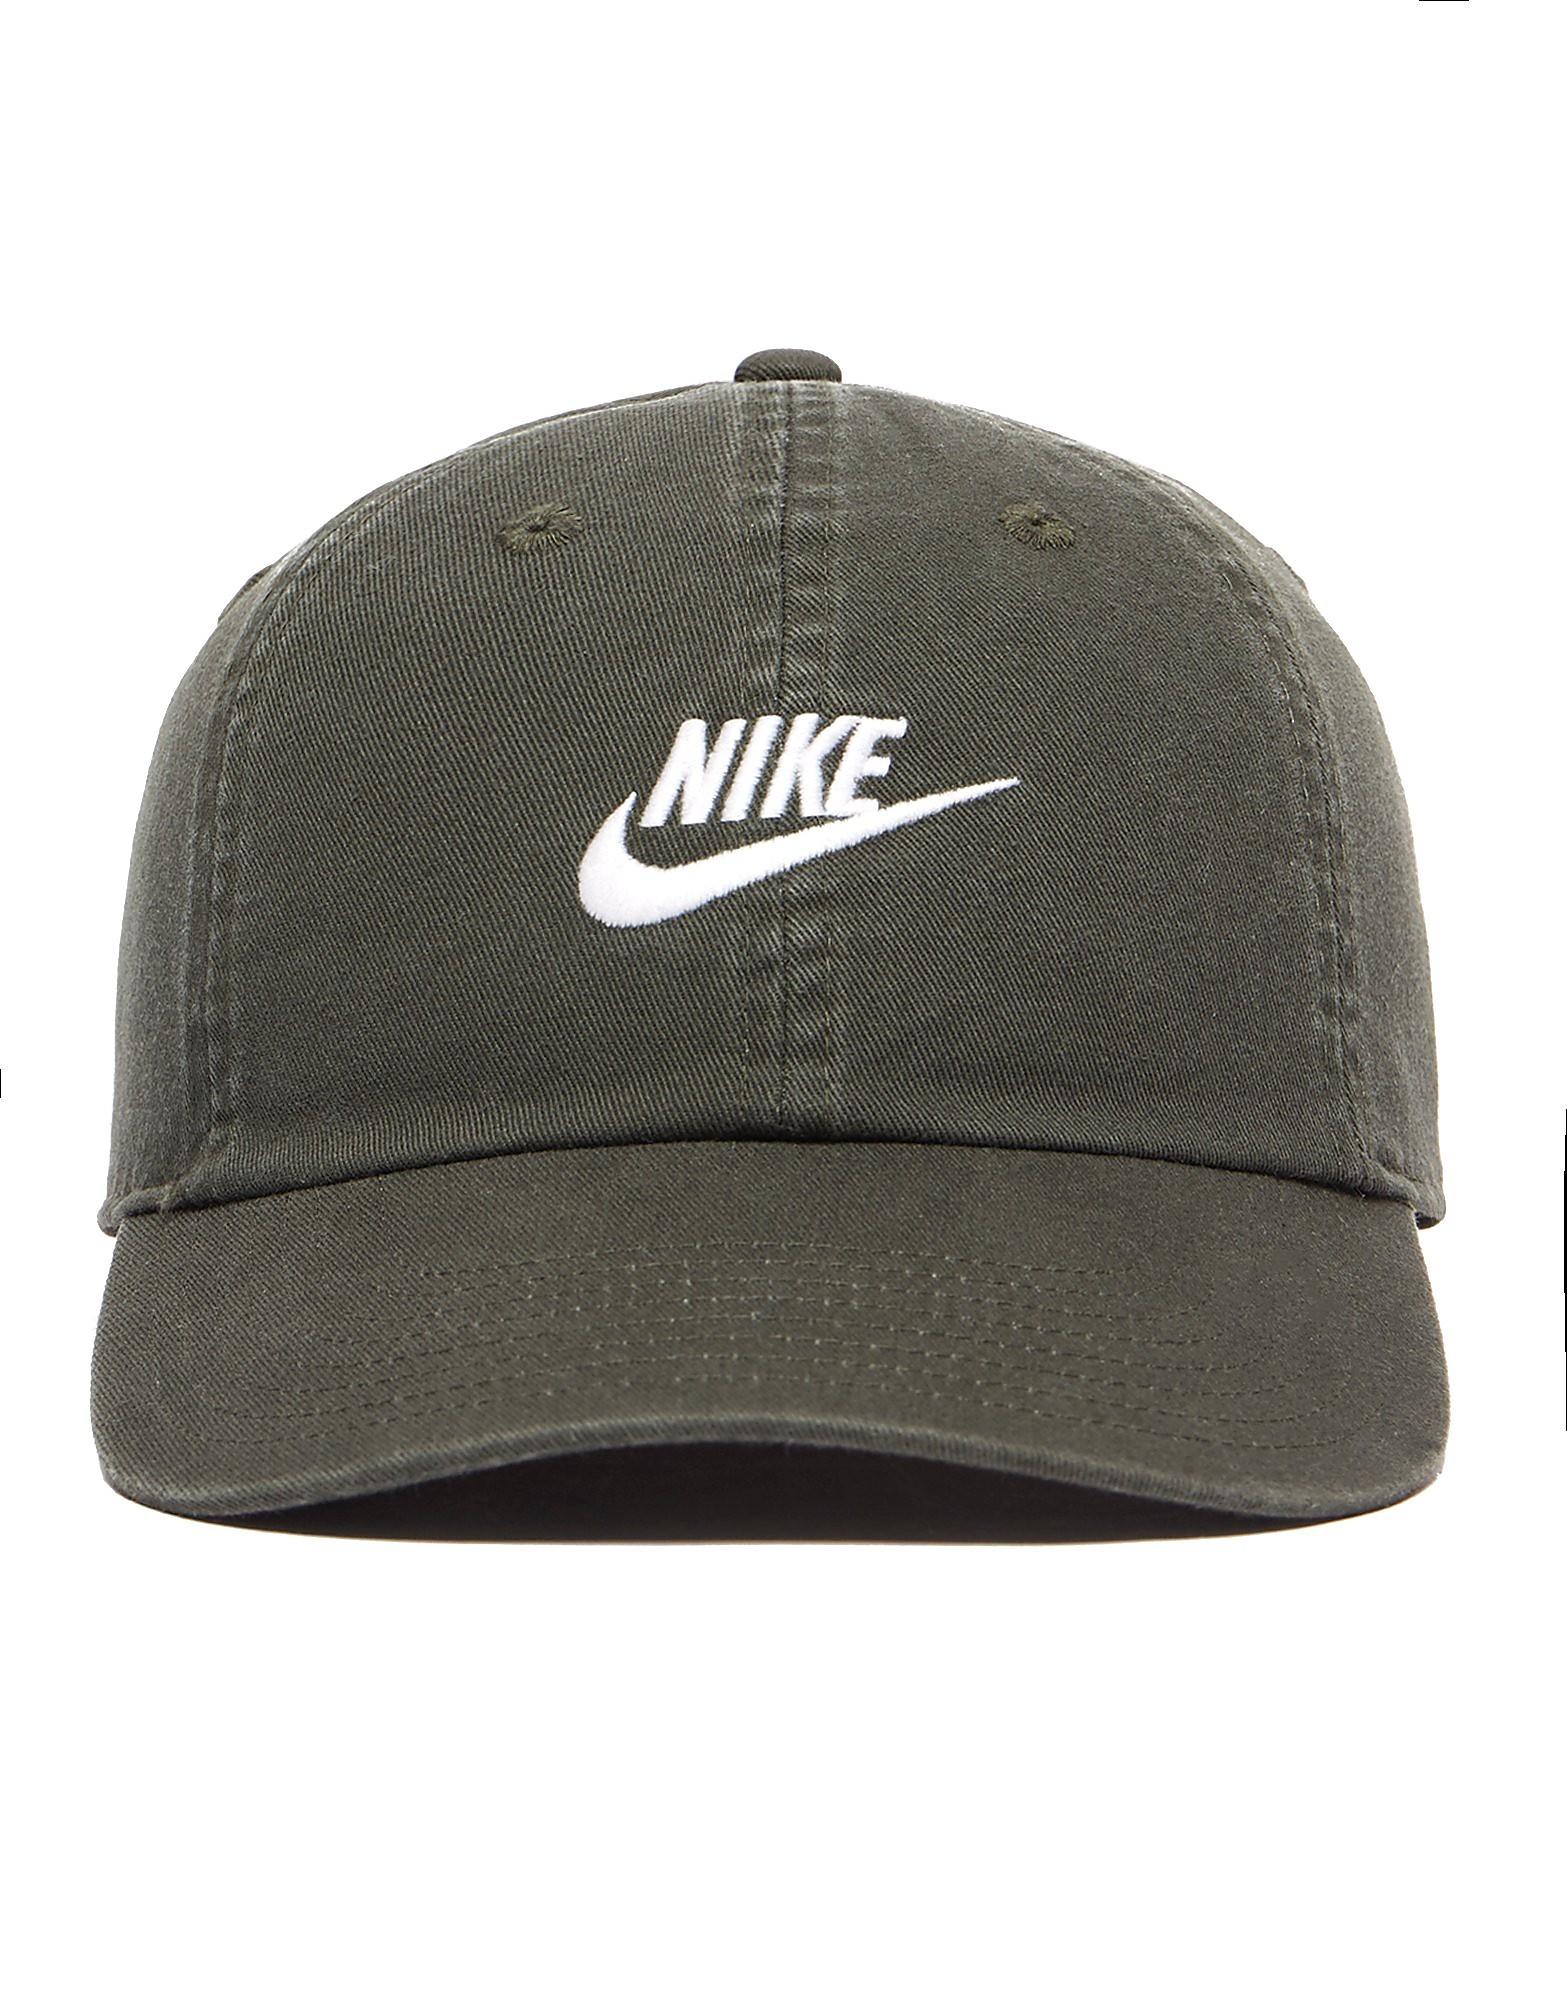 Nike Futura 2 Washed Cap